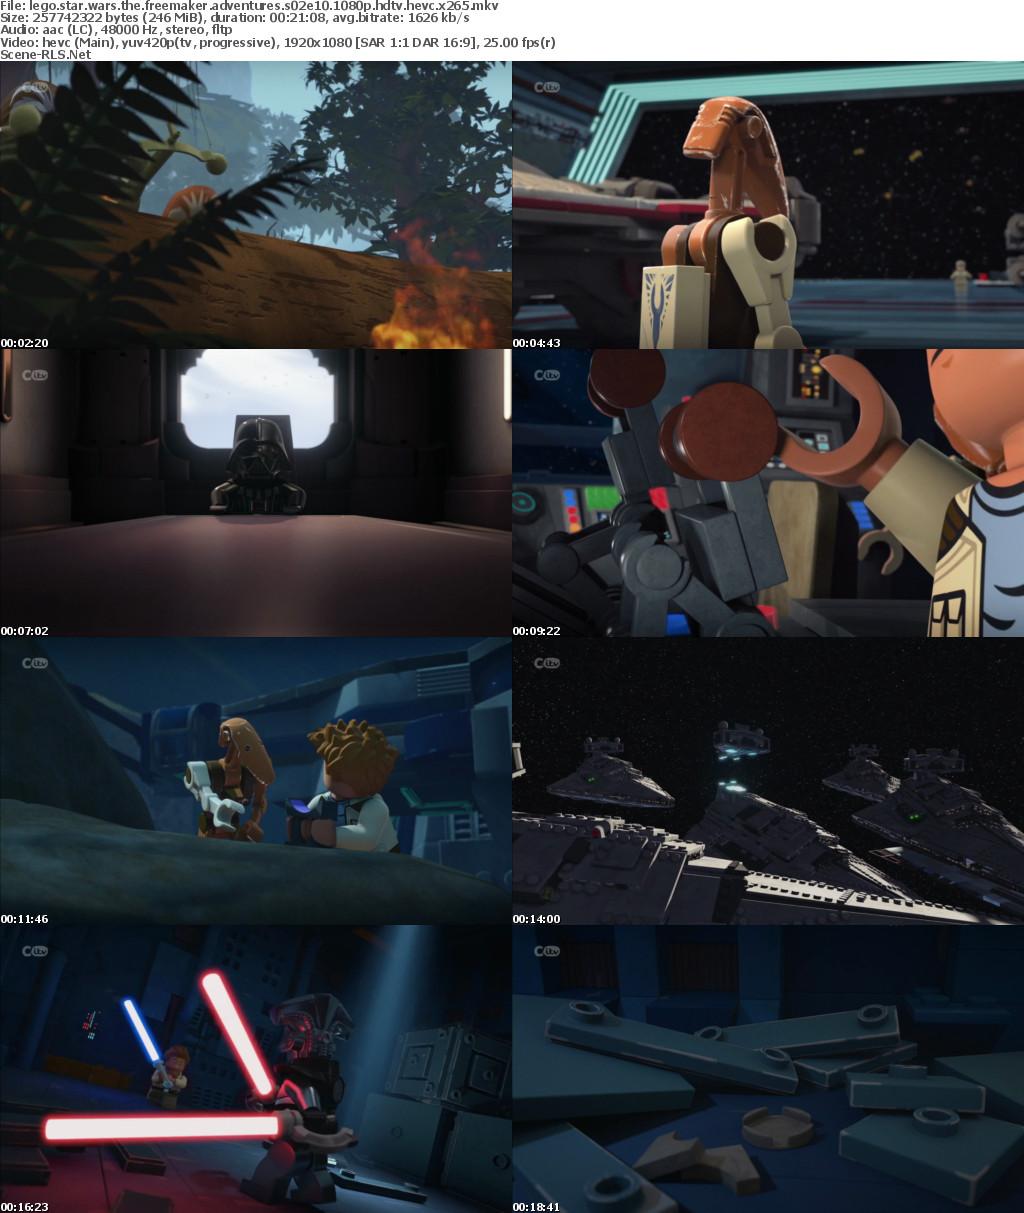 Lego Star Wars The Freemaker Adventures S02E10 1080p HDTV